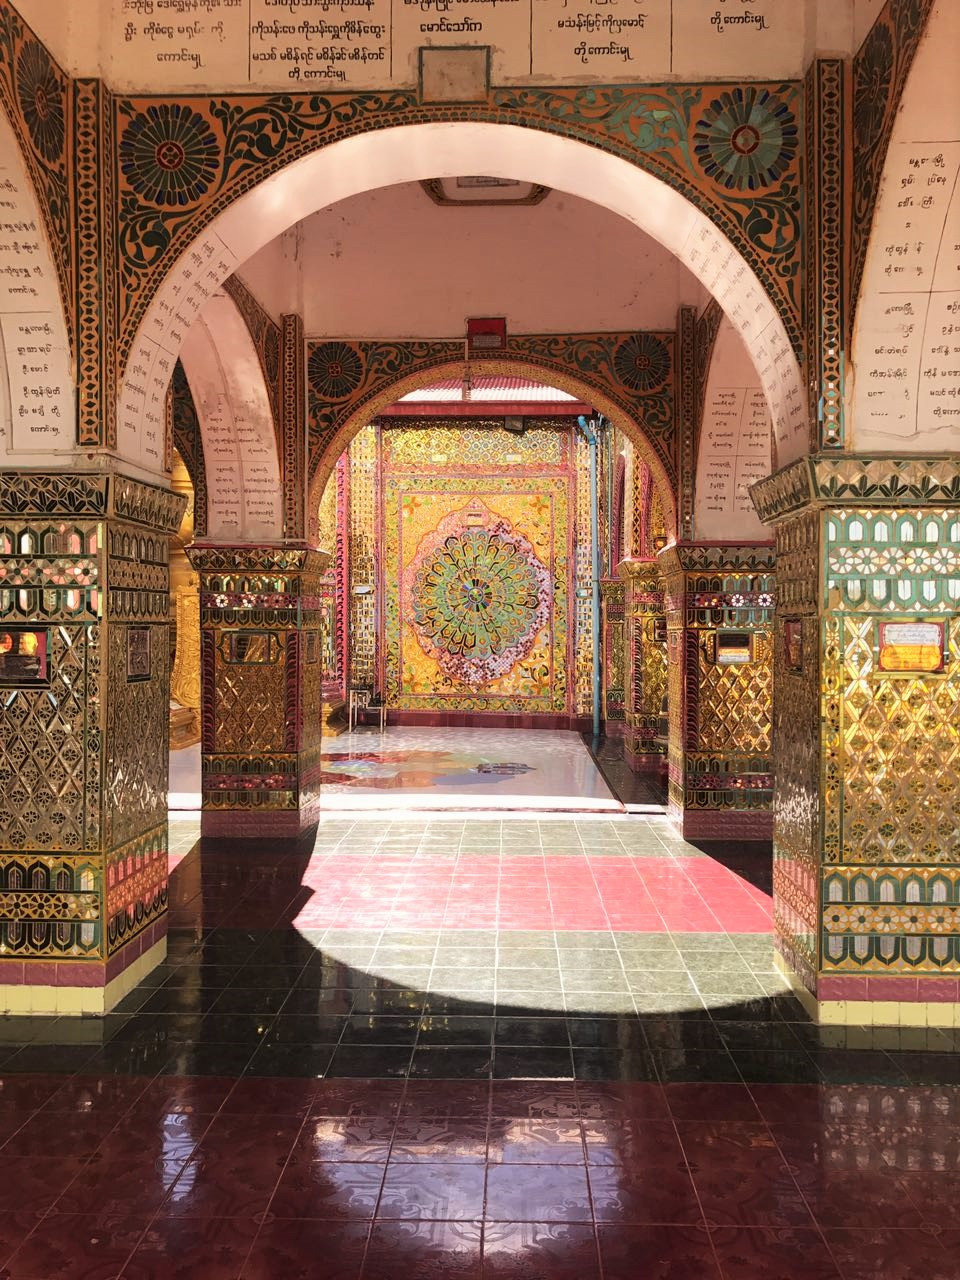 Mandalay HillMandalay- Myanmar